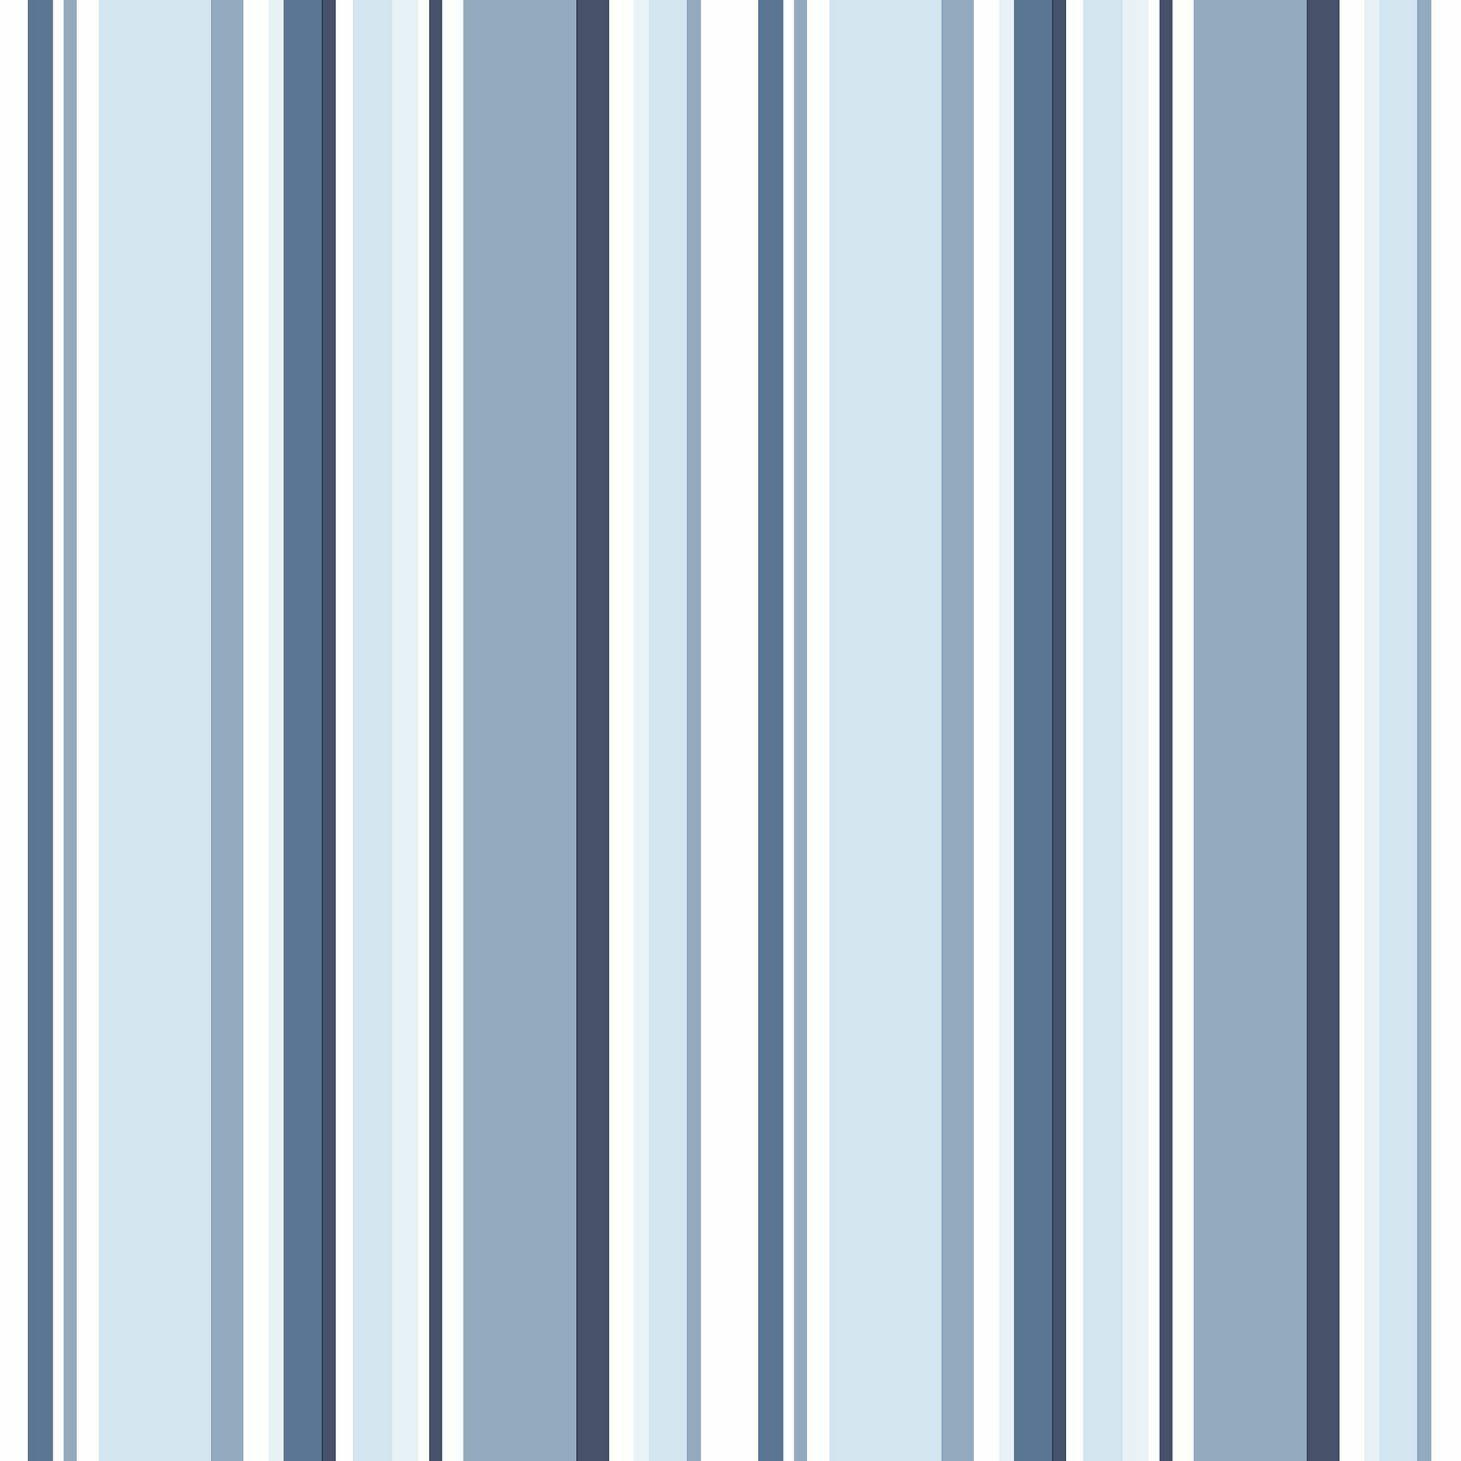 Essener Tapete Simply Stripes 3 ST36911 blue Streifen gestreift Vinyltapete